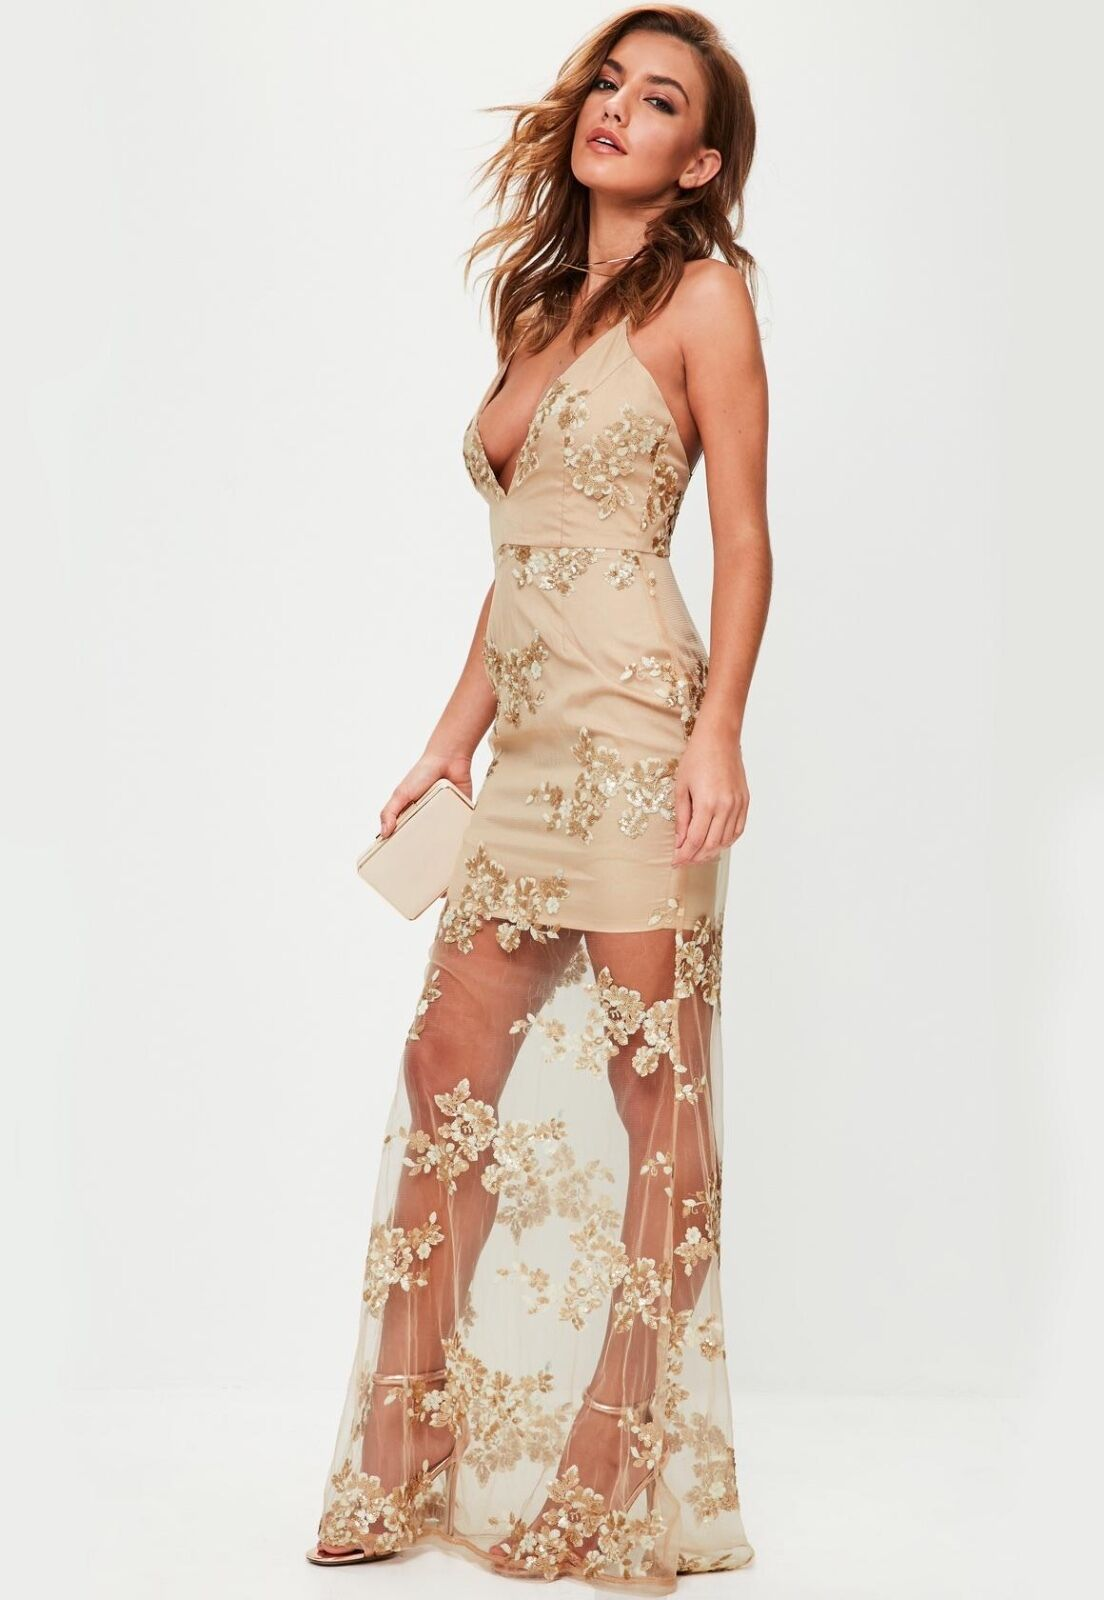 Missguided nude emb. plunge maxi dress sheer bling see thru wedding Birthday